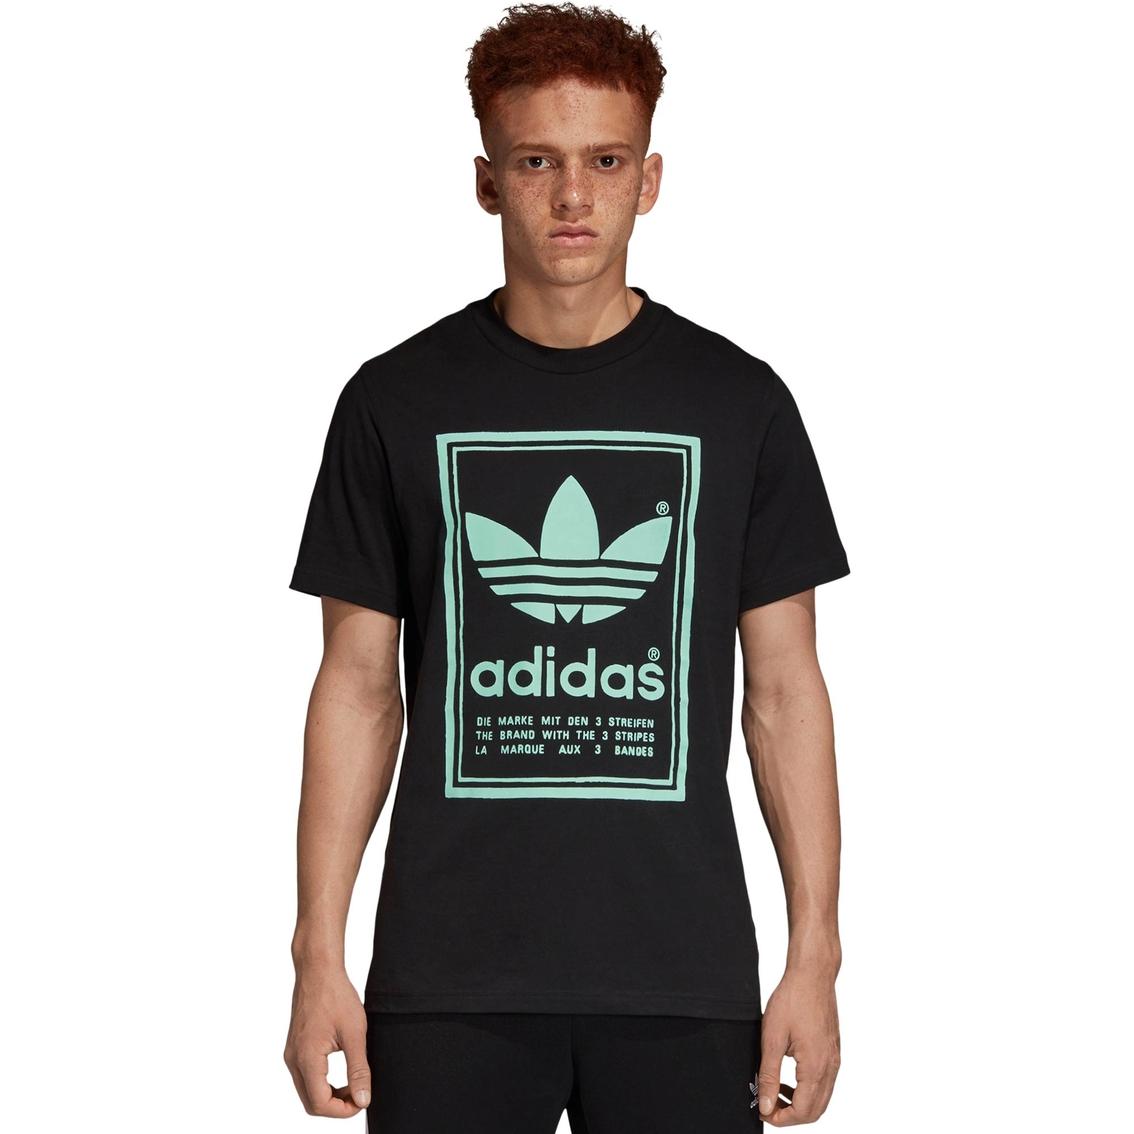 Adidas Vintage Tee   Shirts   Clothing   Shop The Exchange